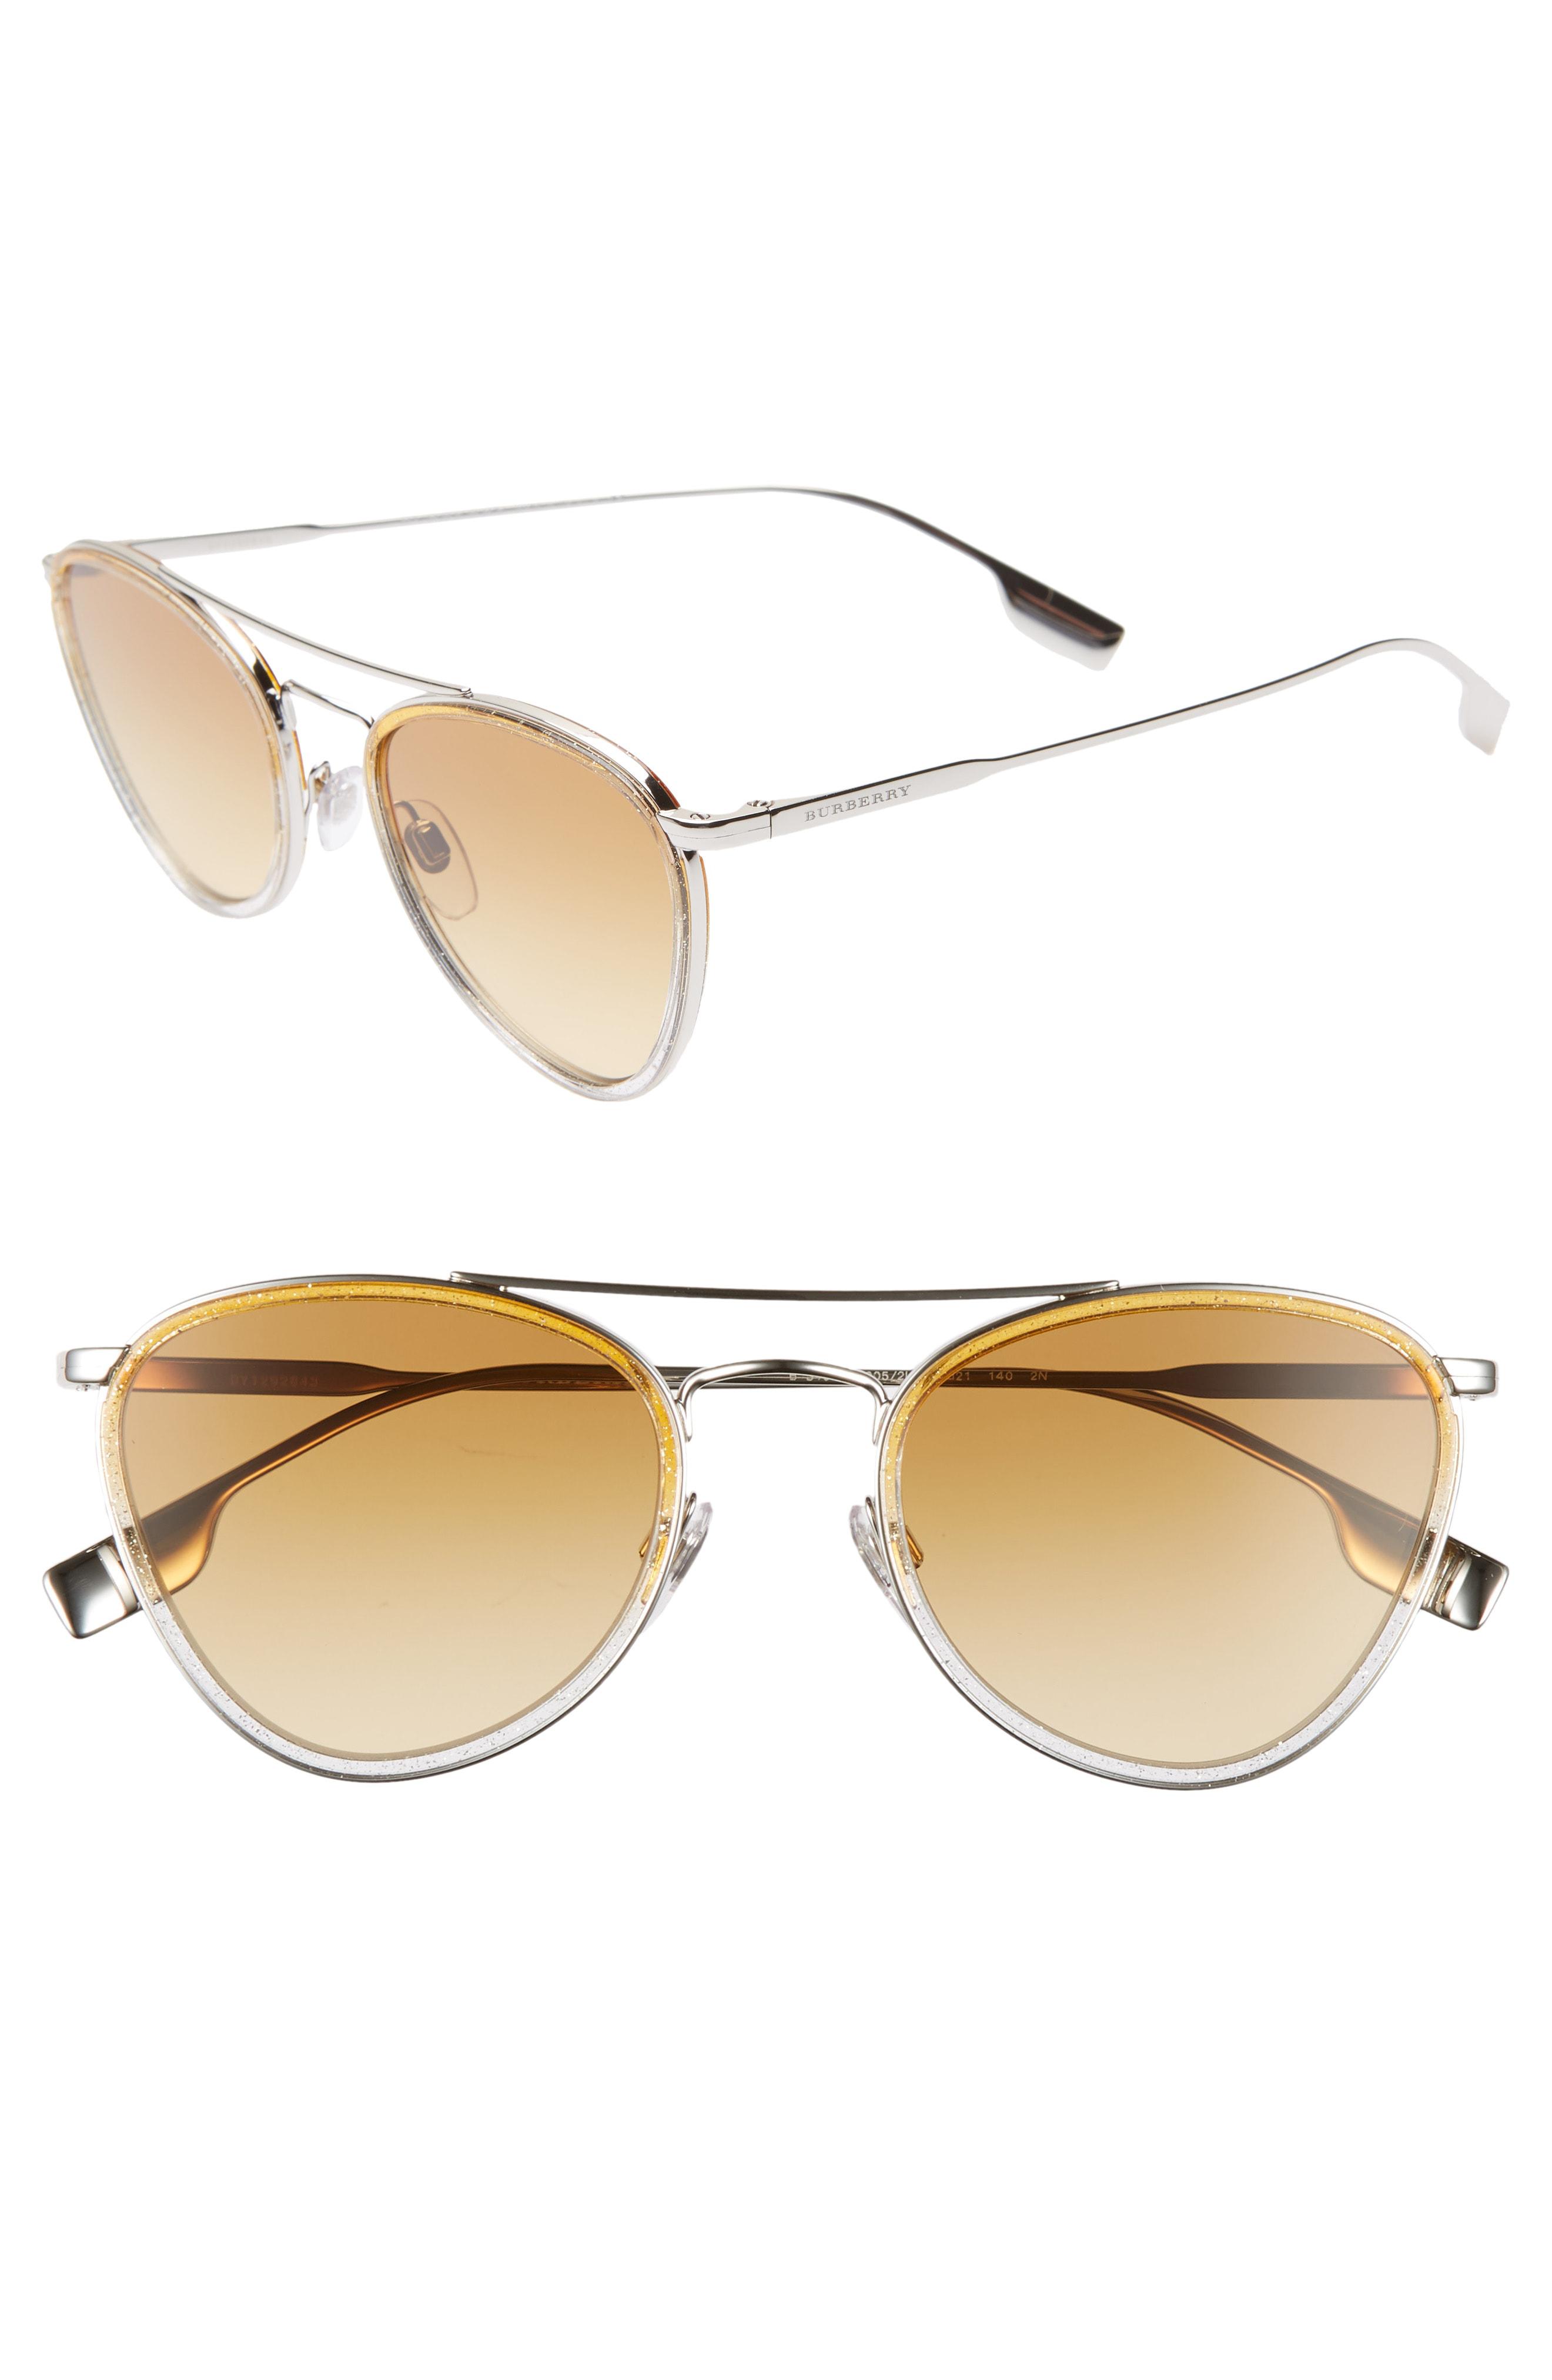 0a2679db01 Burberry 51Mm Aviator Sunglasses - Silver  Lite Yellow Gradient ...